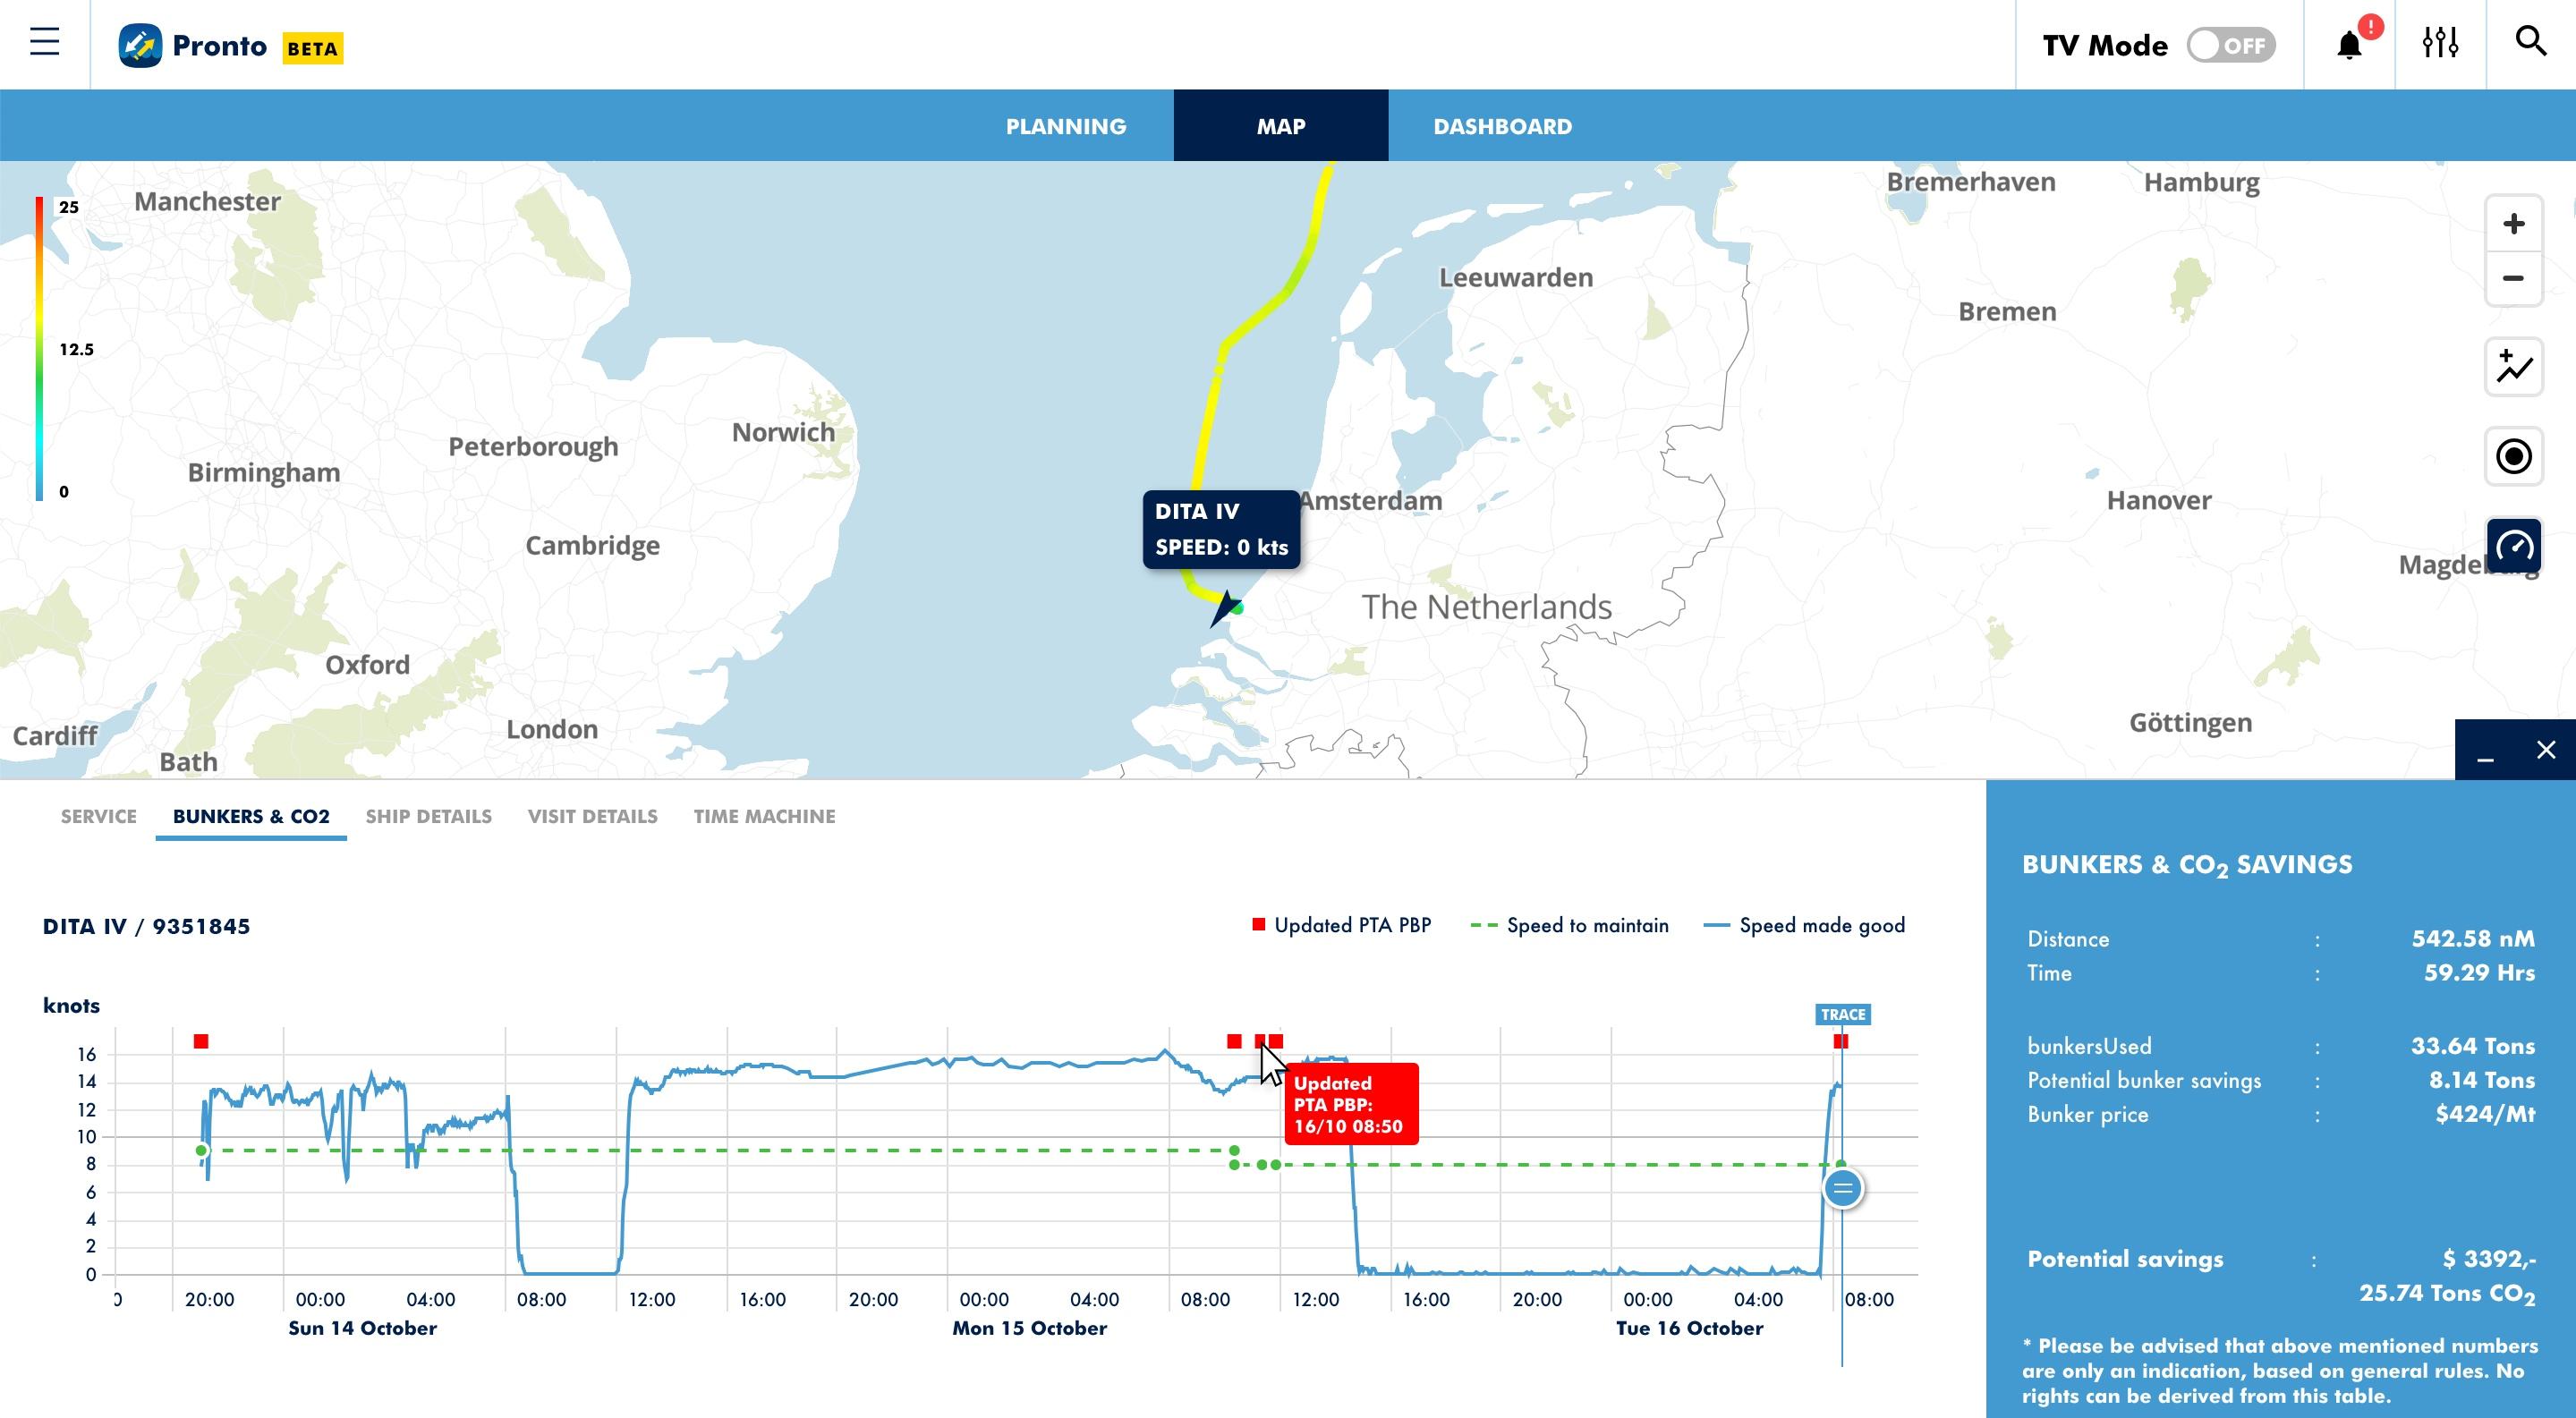 Screenshot of the Port of Rotterdam's Pronto call optimisation program